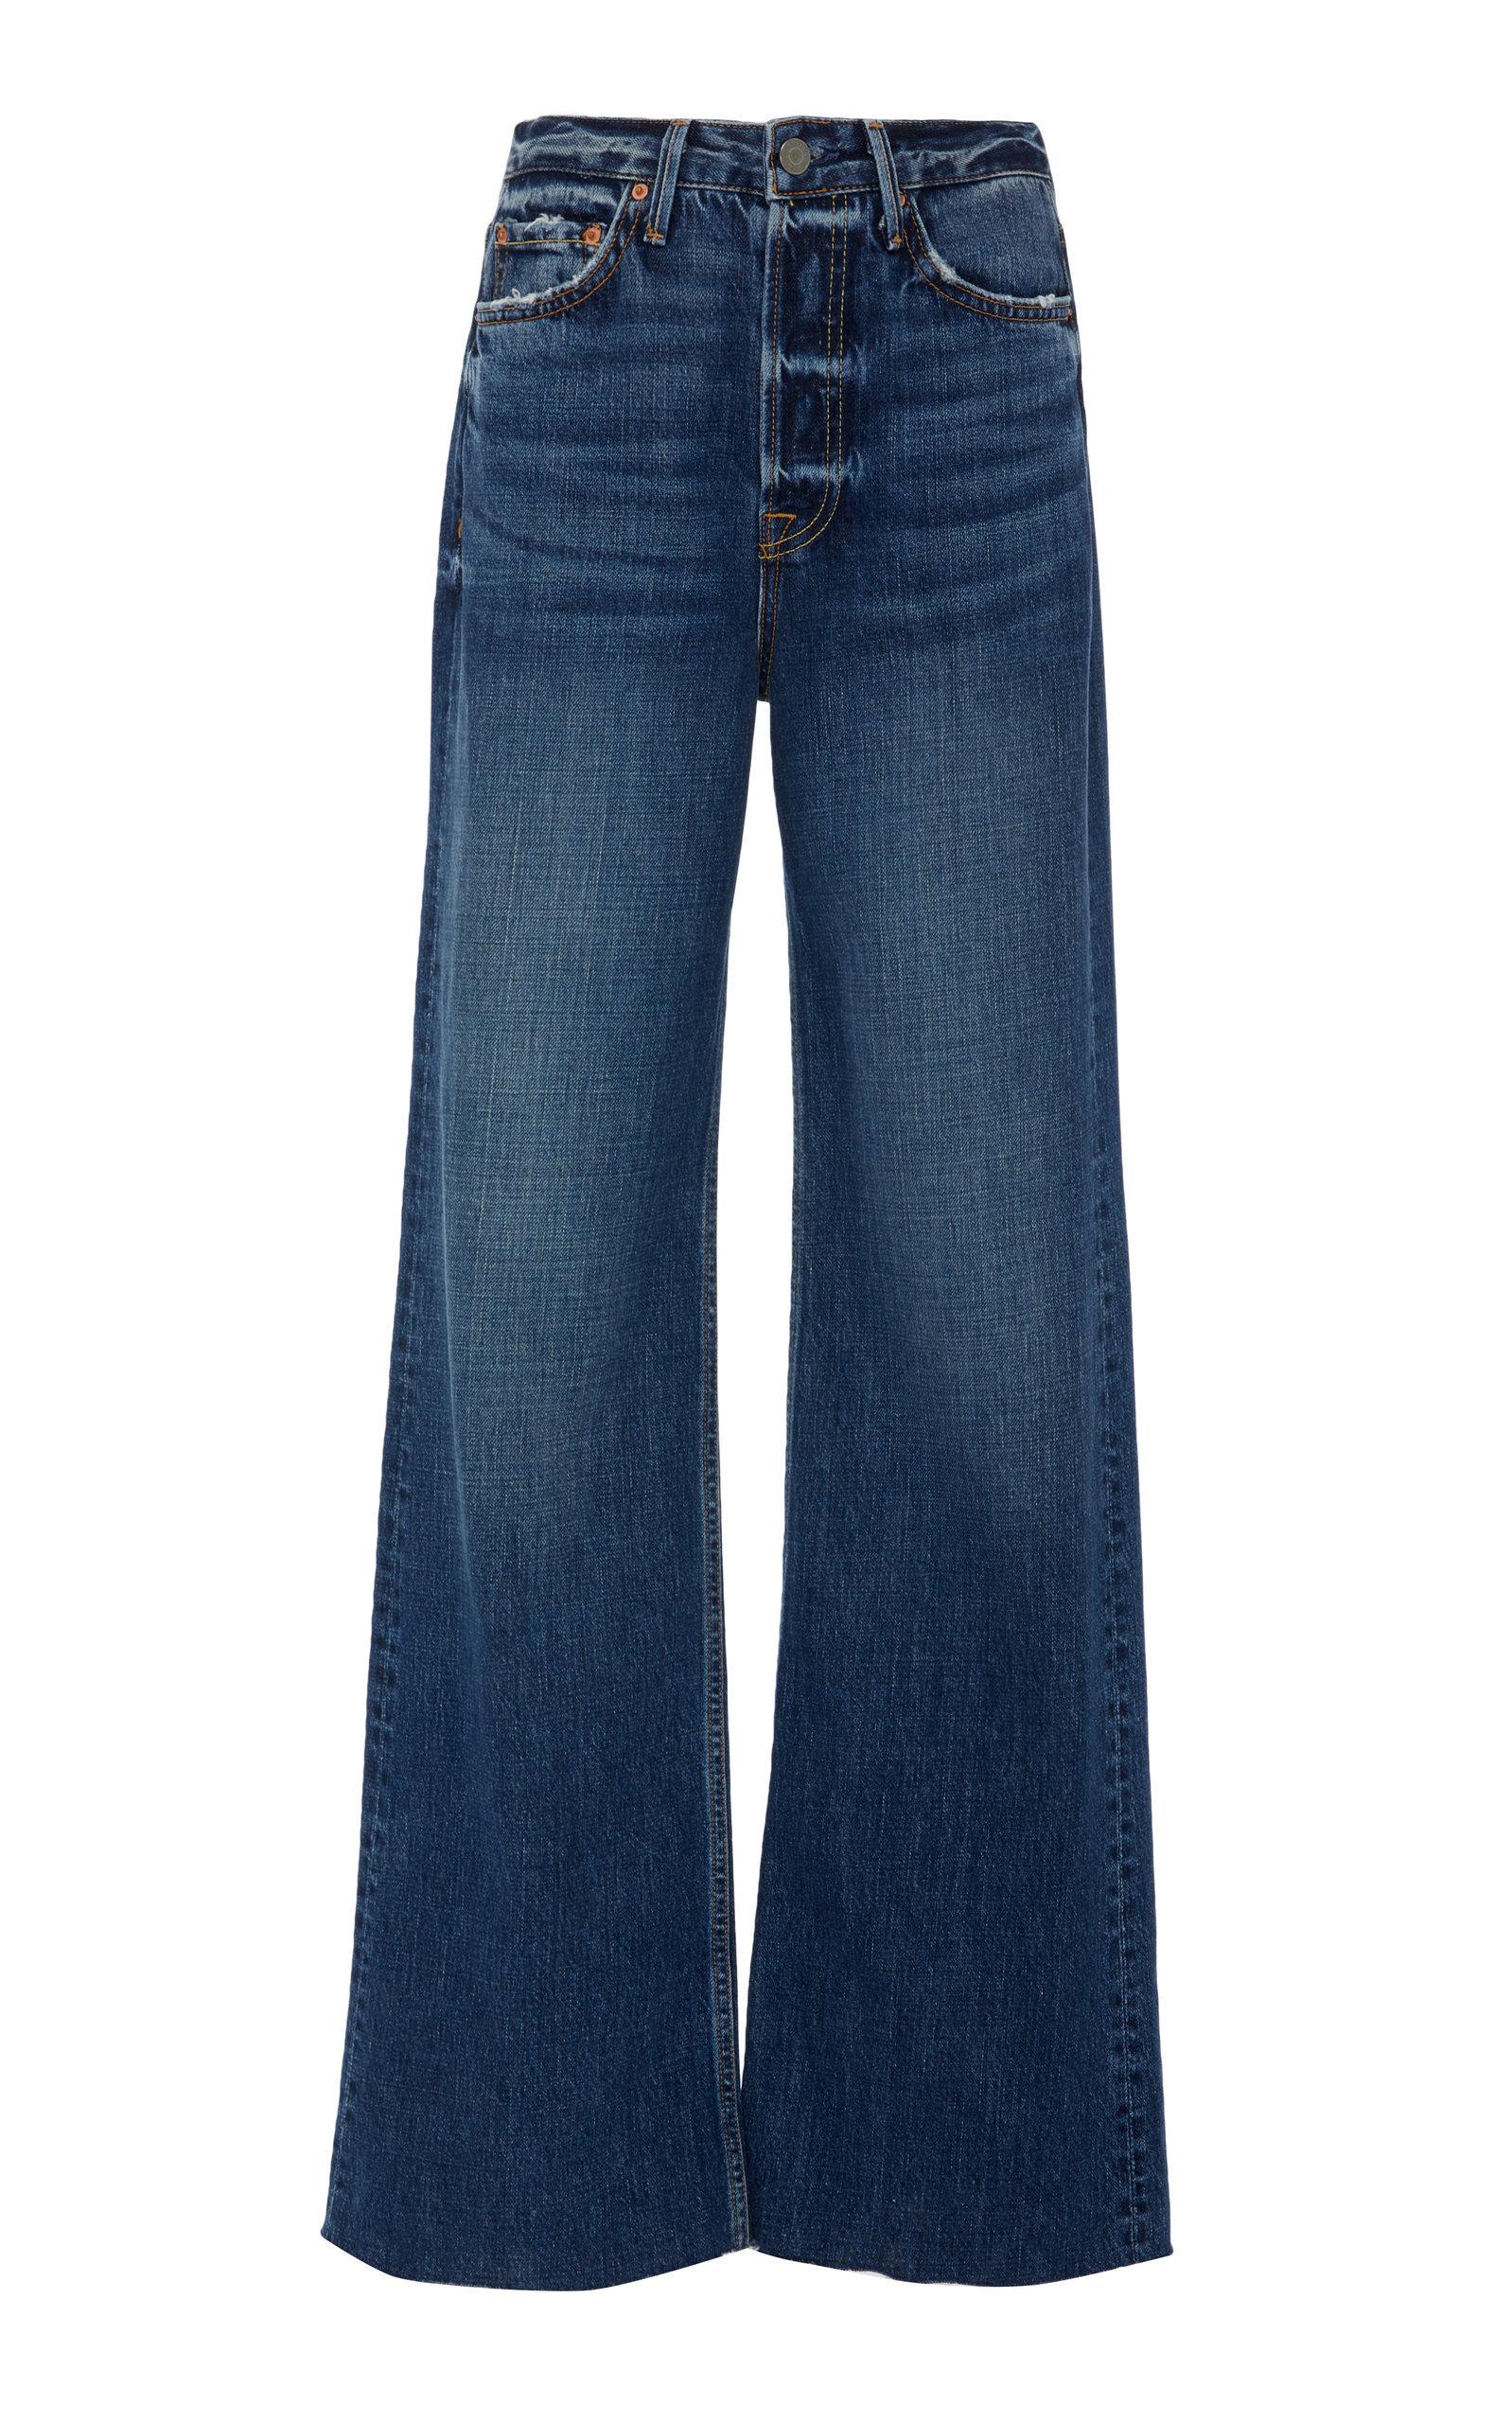 Street One Jeans Michele pantaloni pants denim donna stretch slim fit